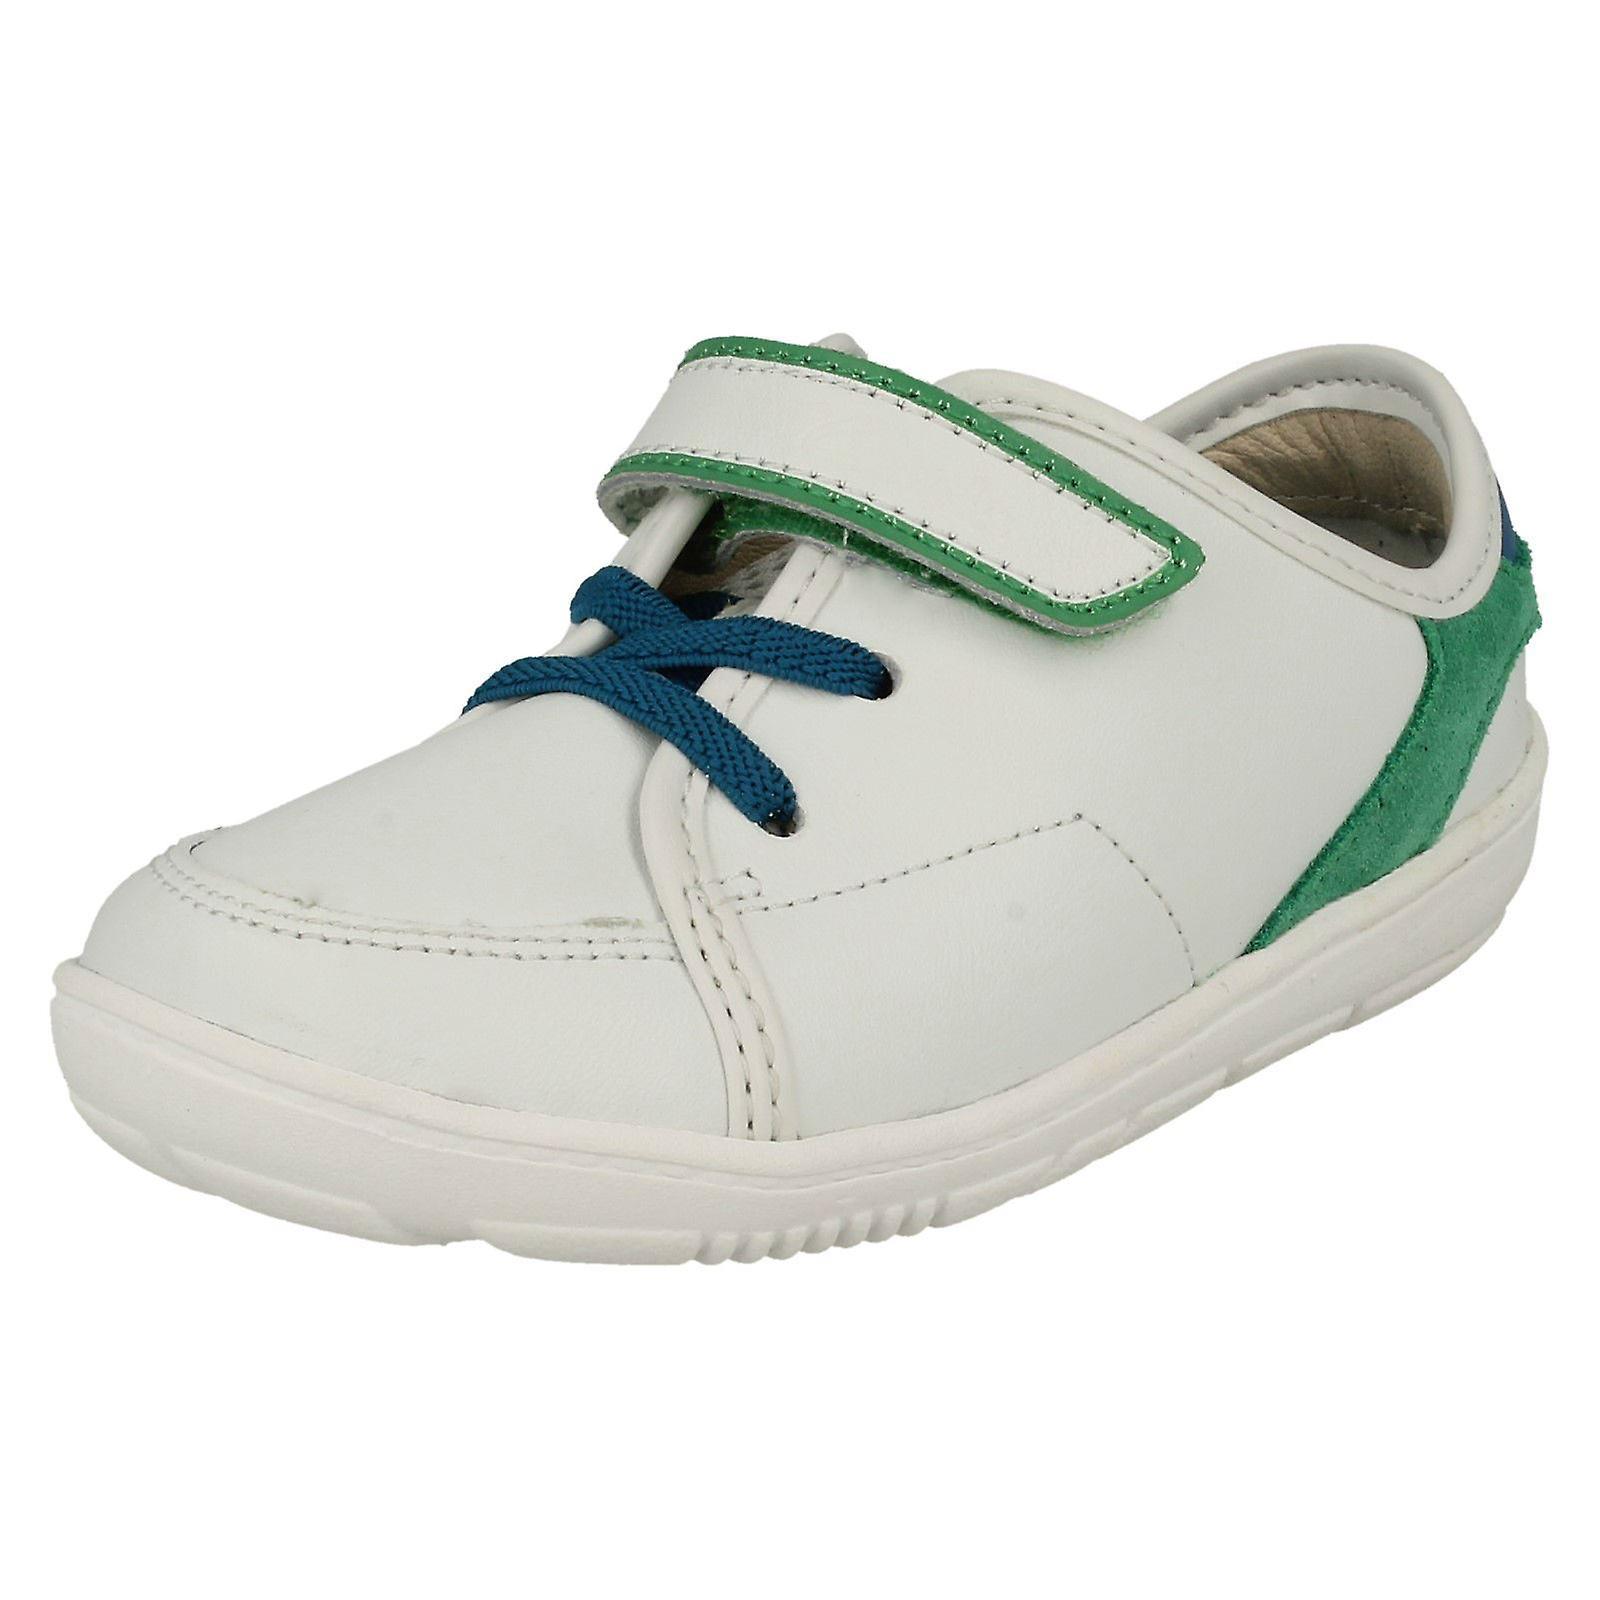 Boys Clarks First Trainer Style scarpe Maxi Leo | Prezzo speciale  | Sig/Sig Ra Scarpa